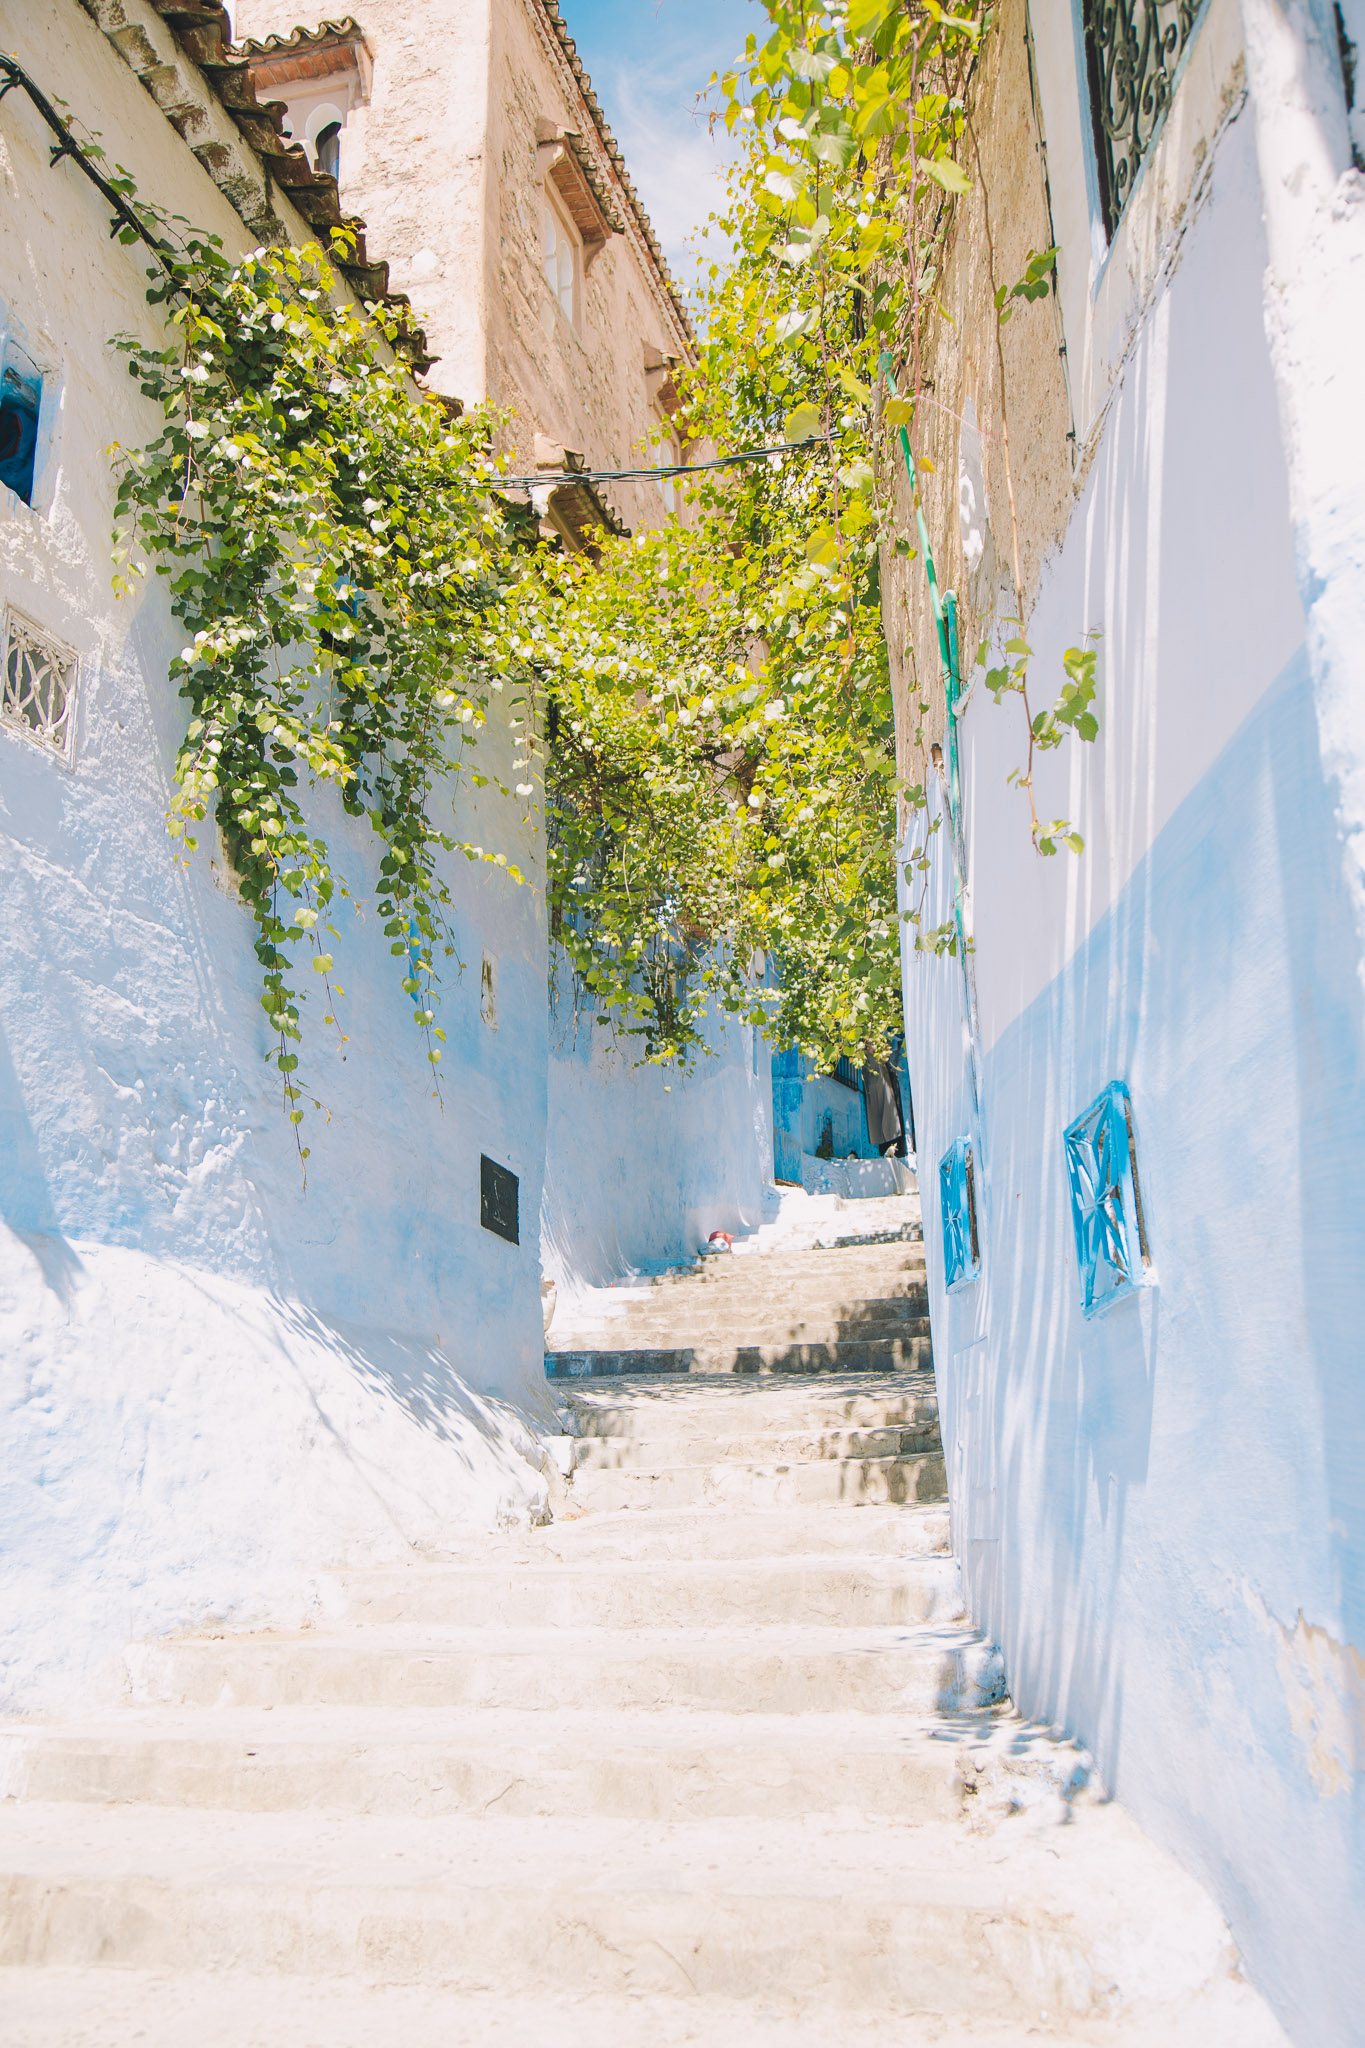 morocco-chefchaouen-blue-city-10.jpg